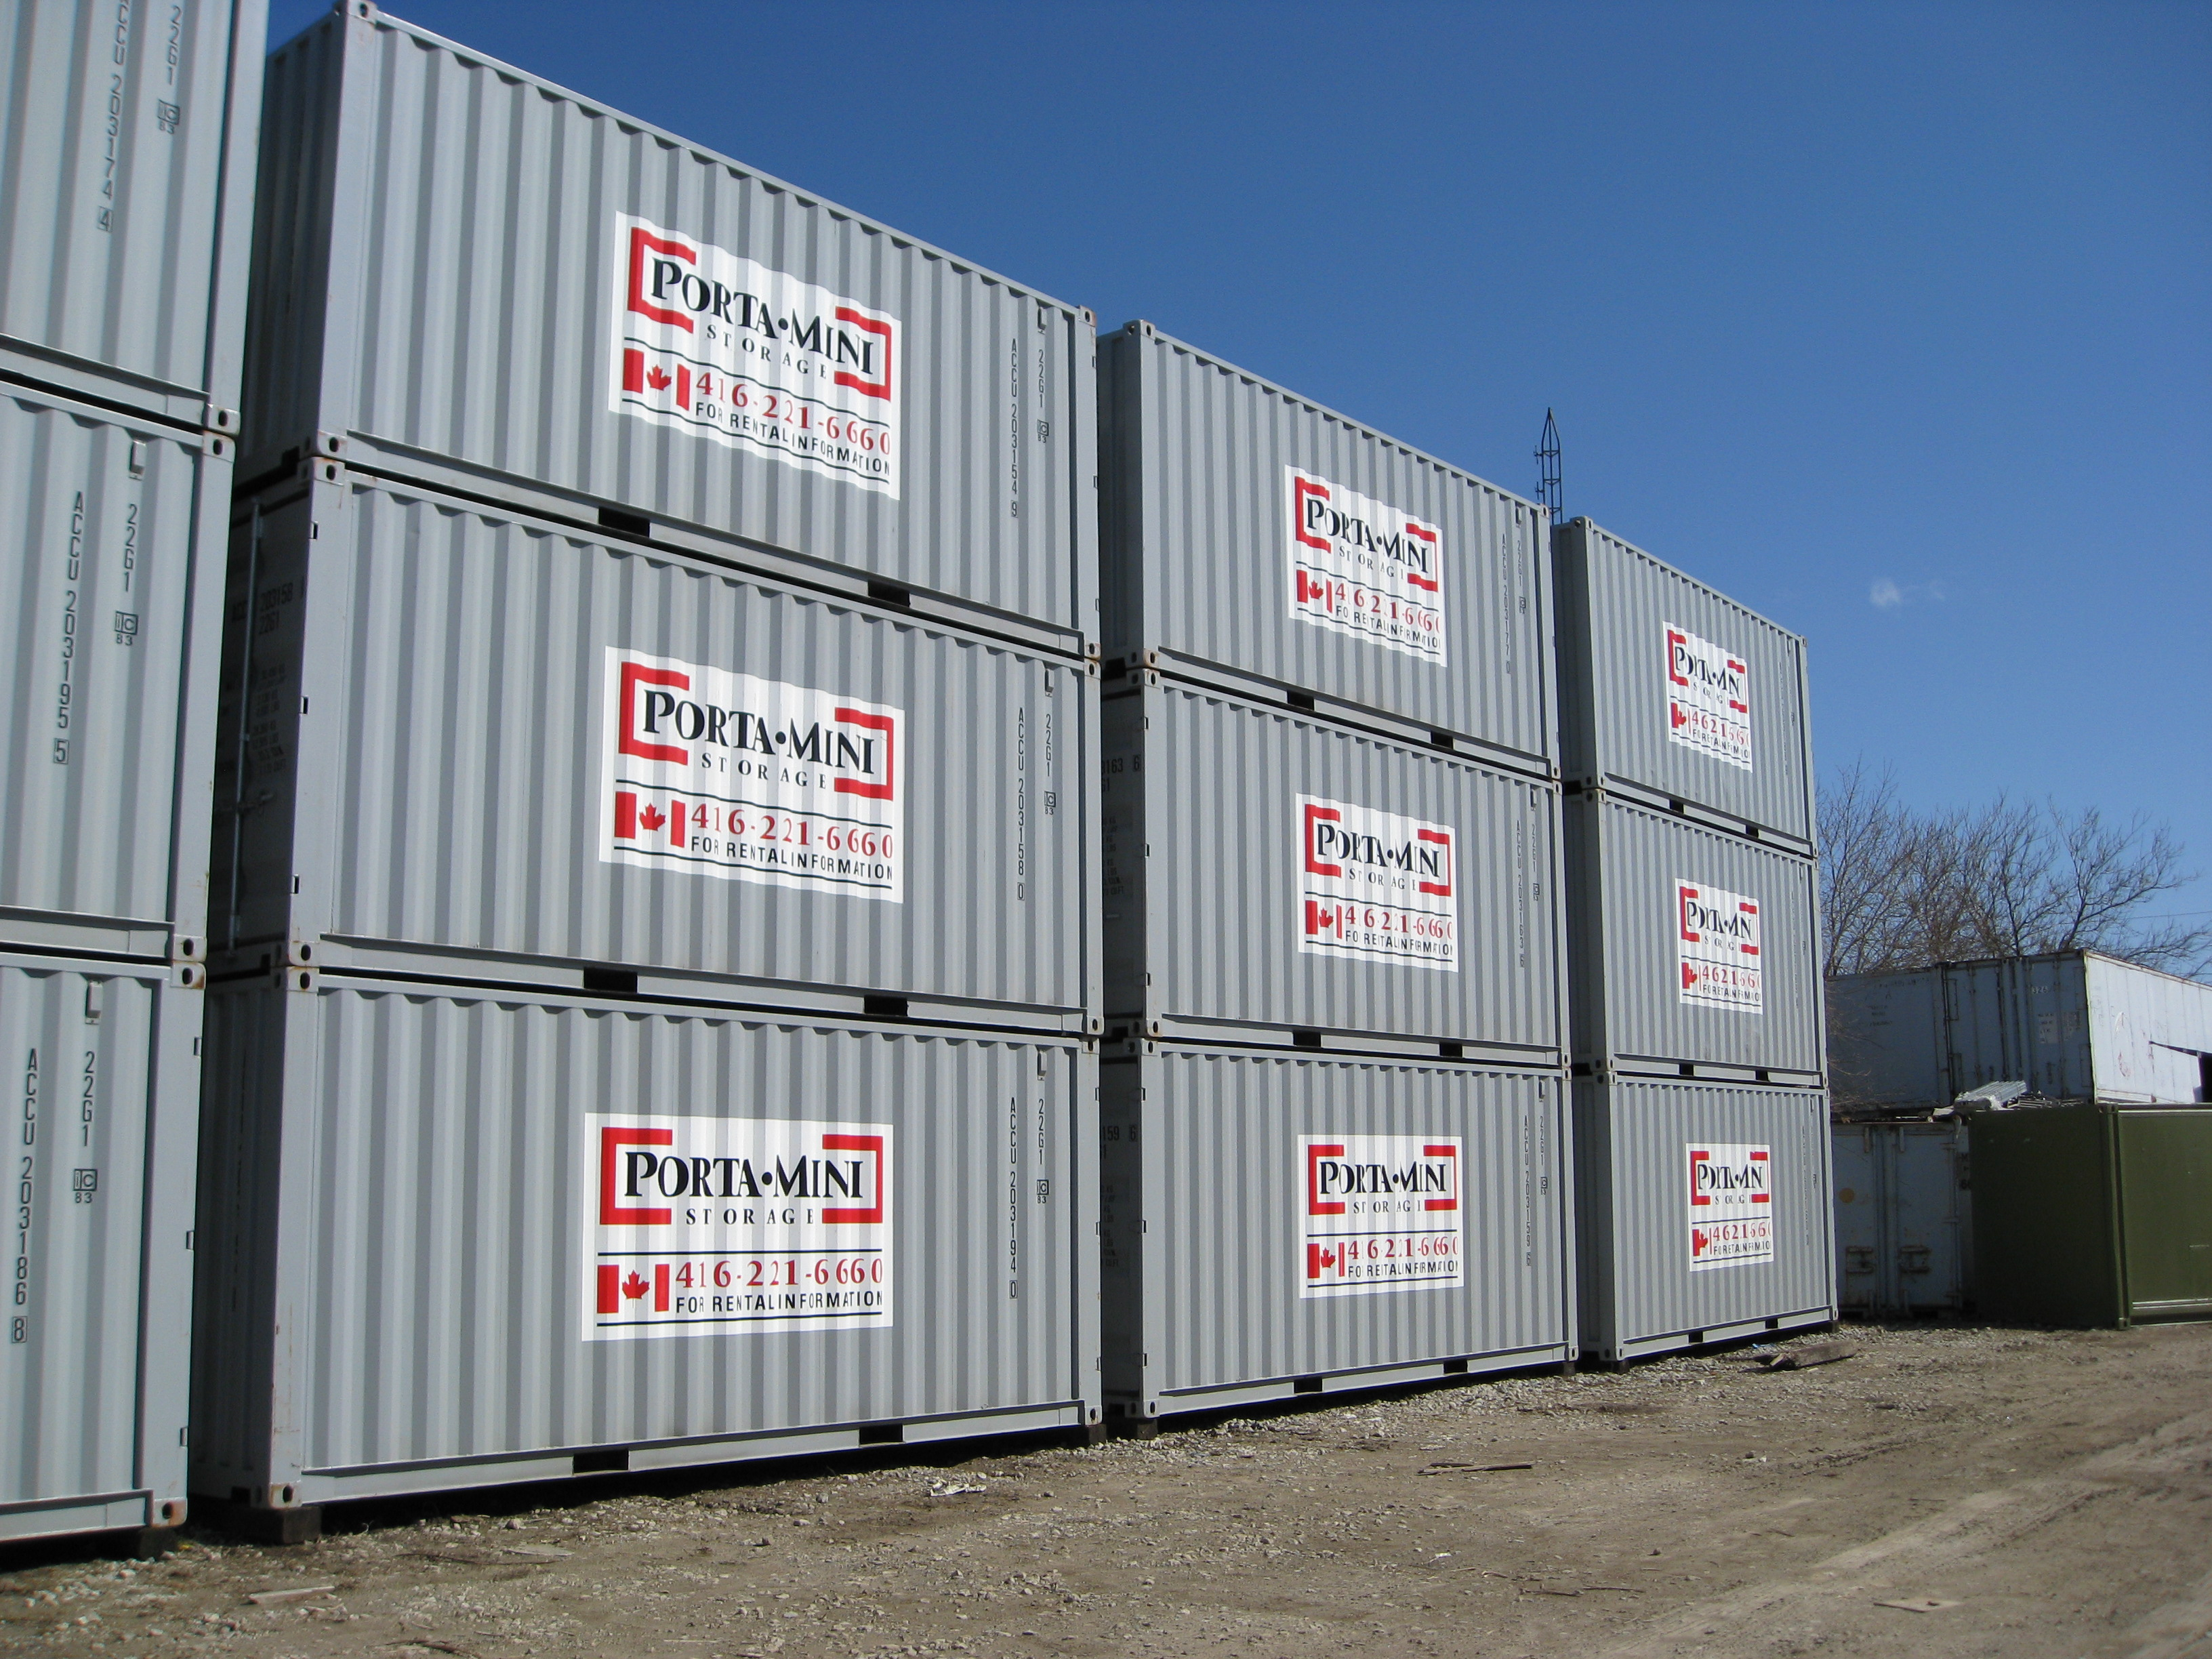 Portamini storage Storage Containers Start Up Business Storage